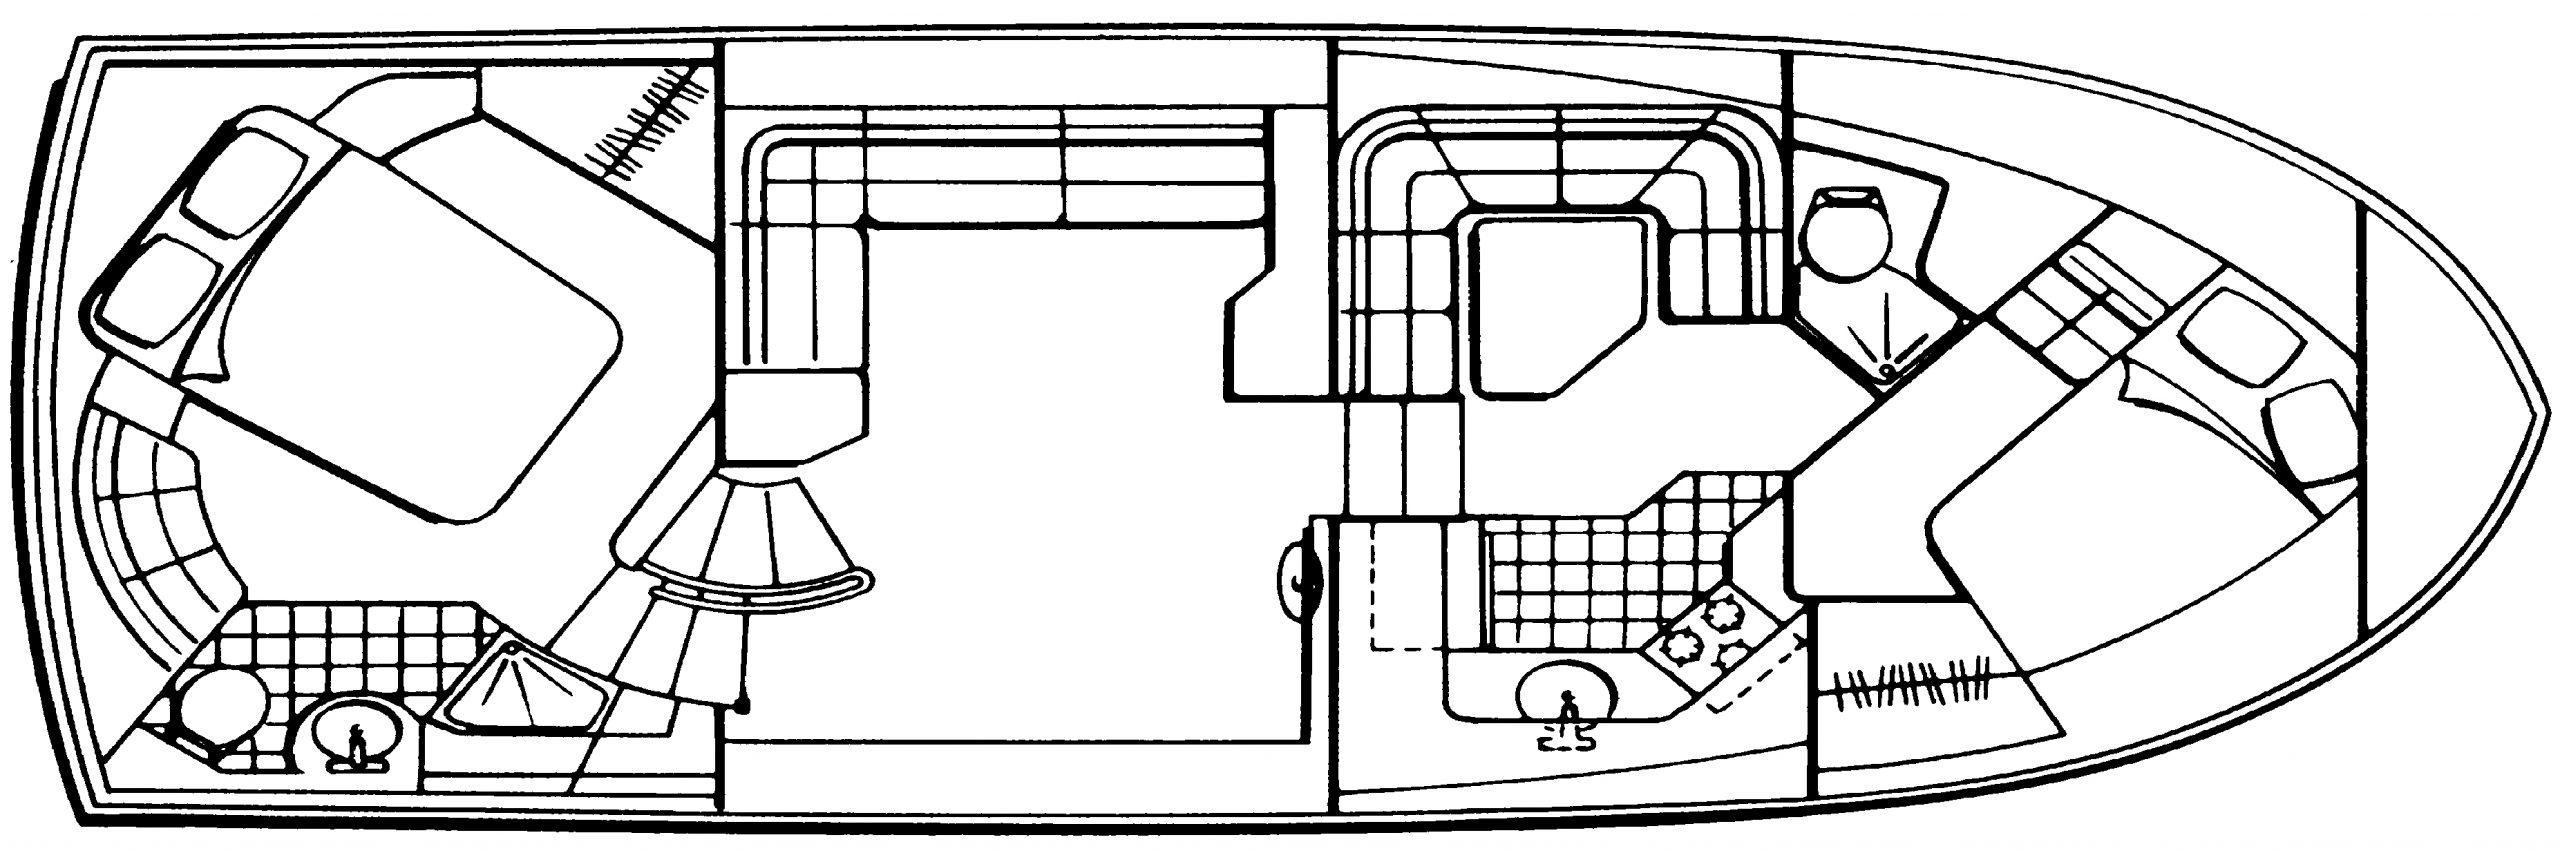 36 Aft Cabin; 370 Aft Cabin Floor Plan 2